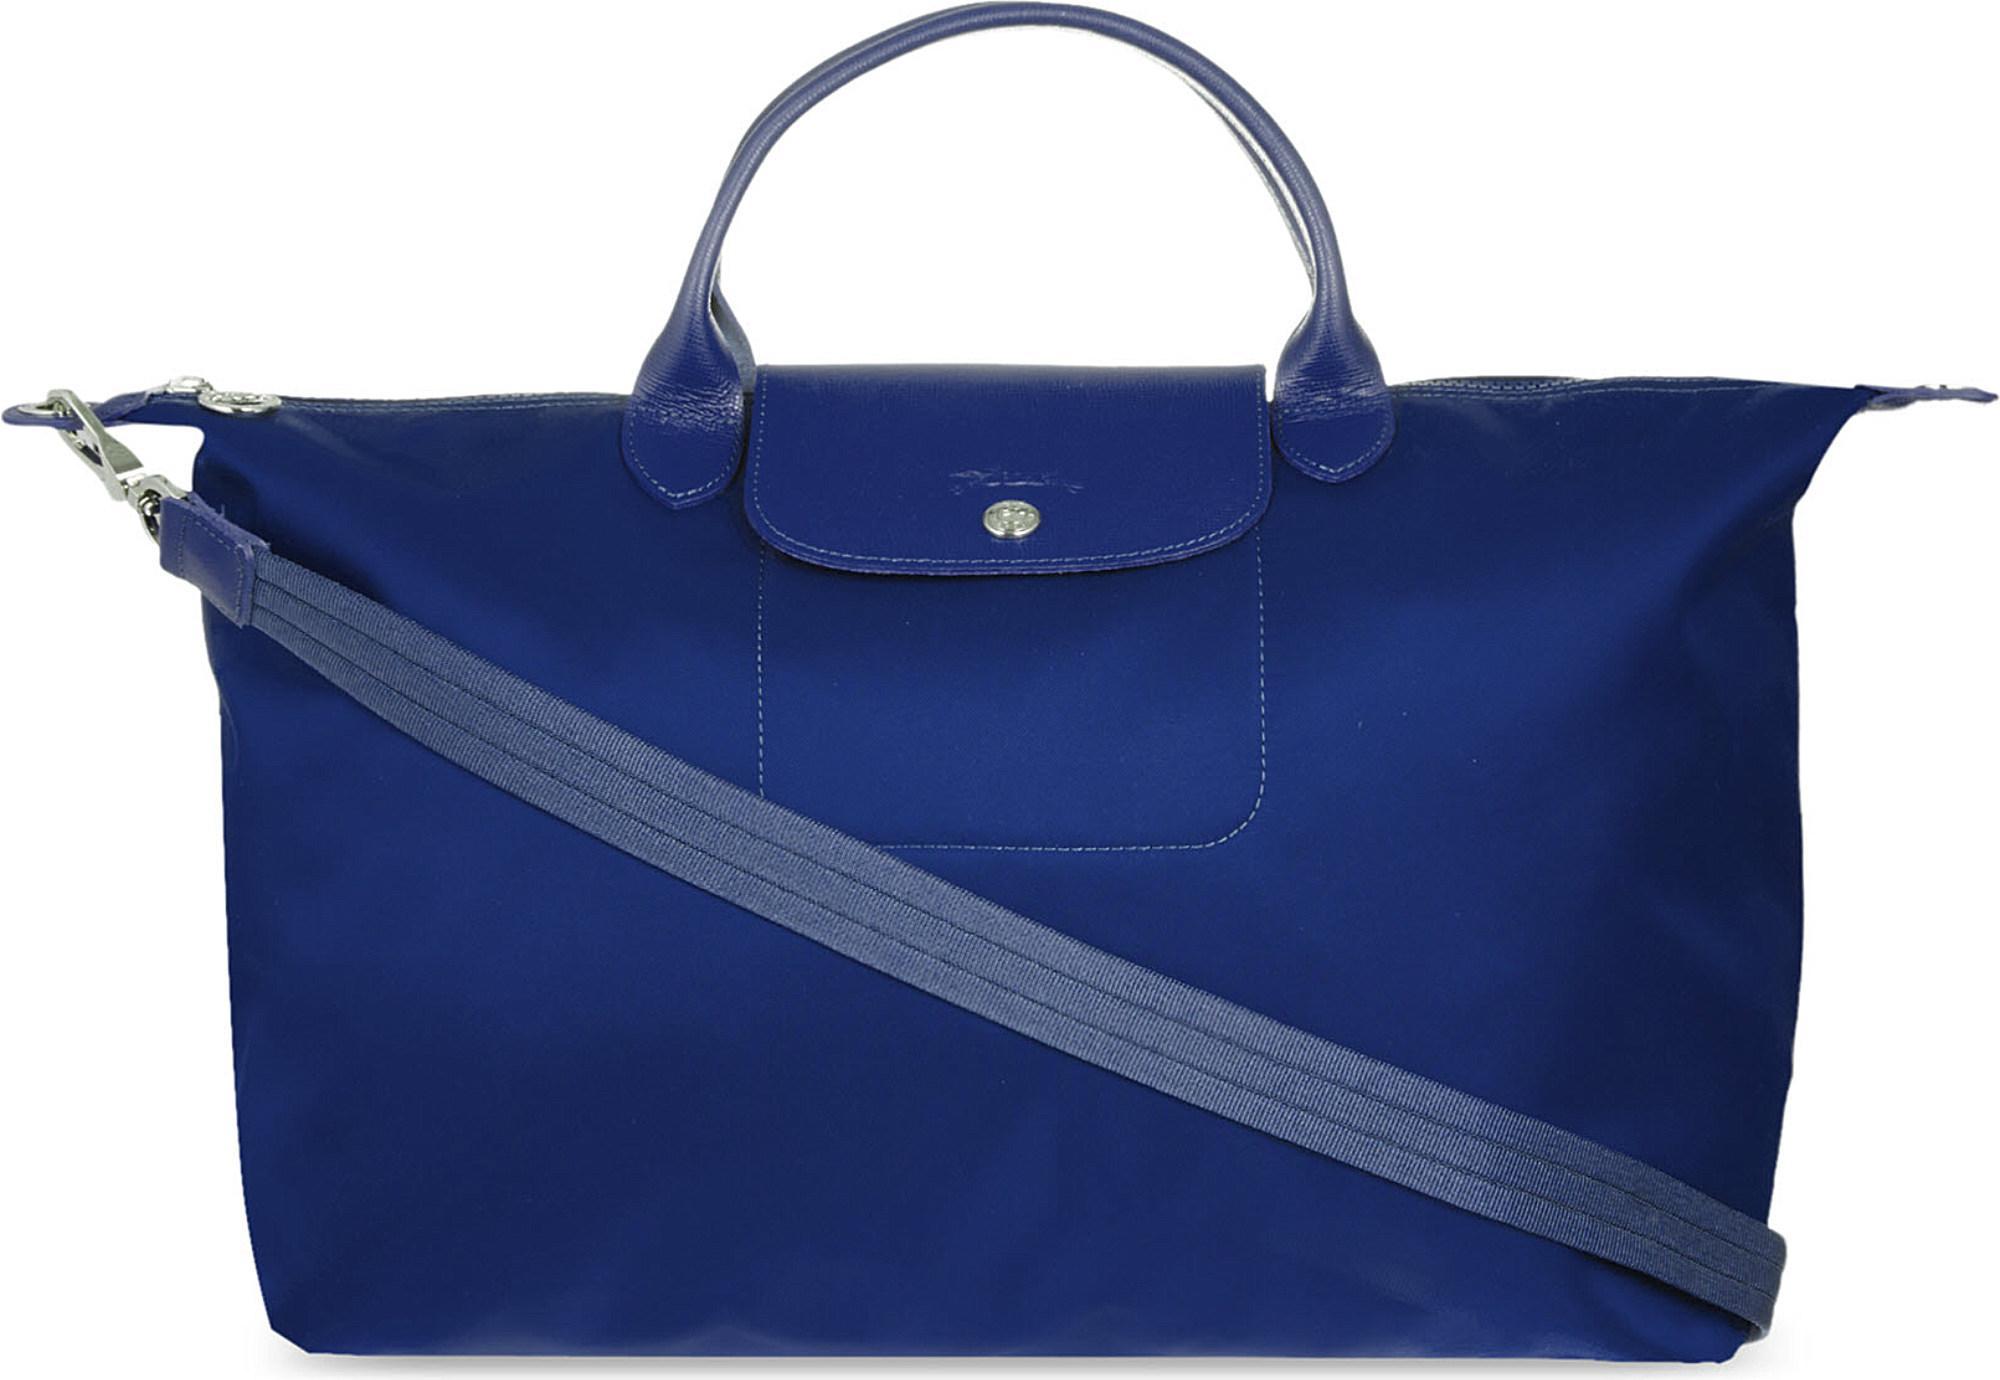 9f41b7601489 Longchamp Le Pliage Neo Large Handbag in Blue - Lyst